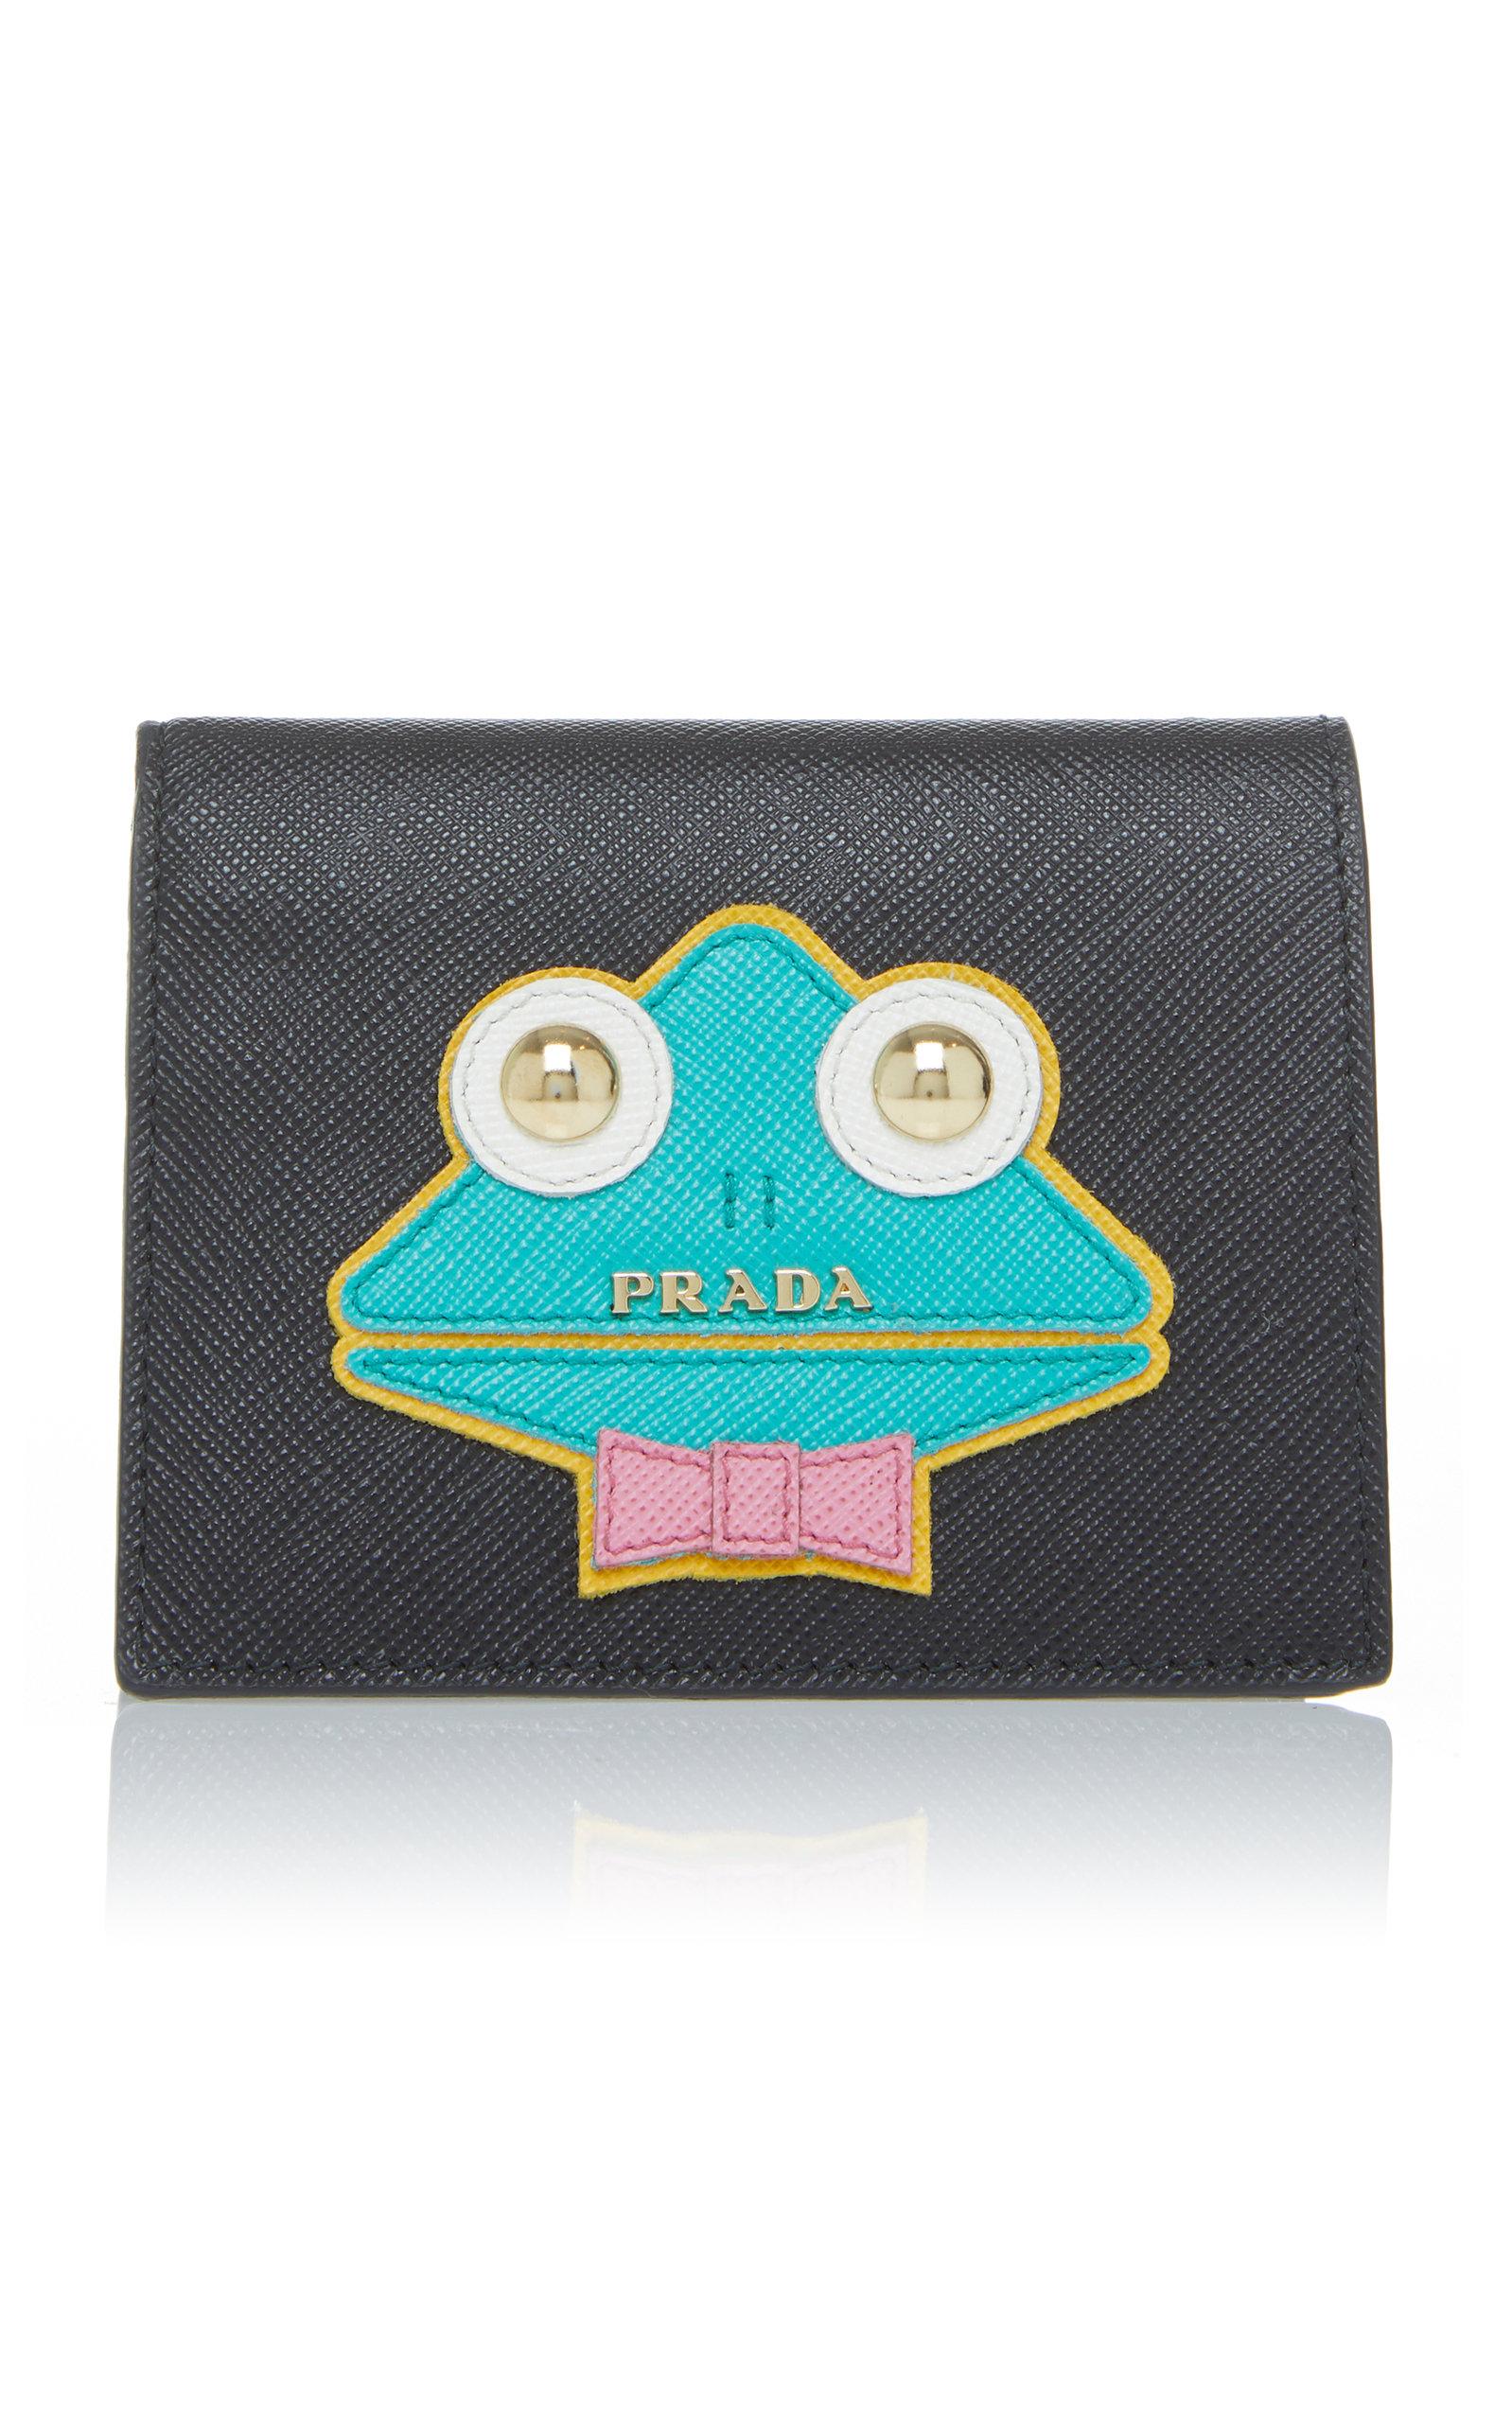 4b1c4d3fdc39 Appliquéd Textured-Leather Wallet by Prada | Moda Operandi